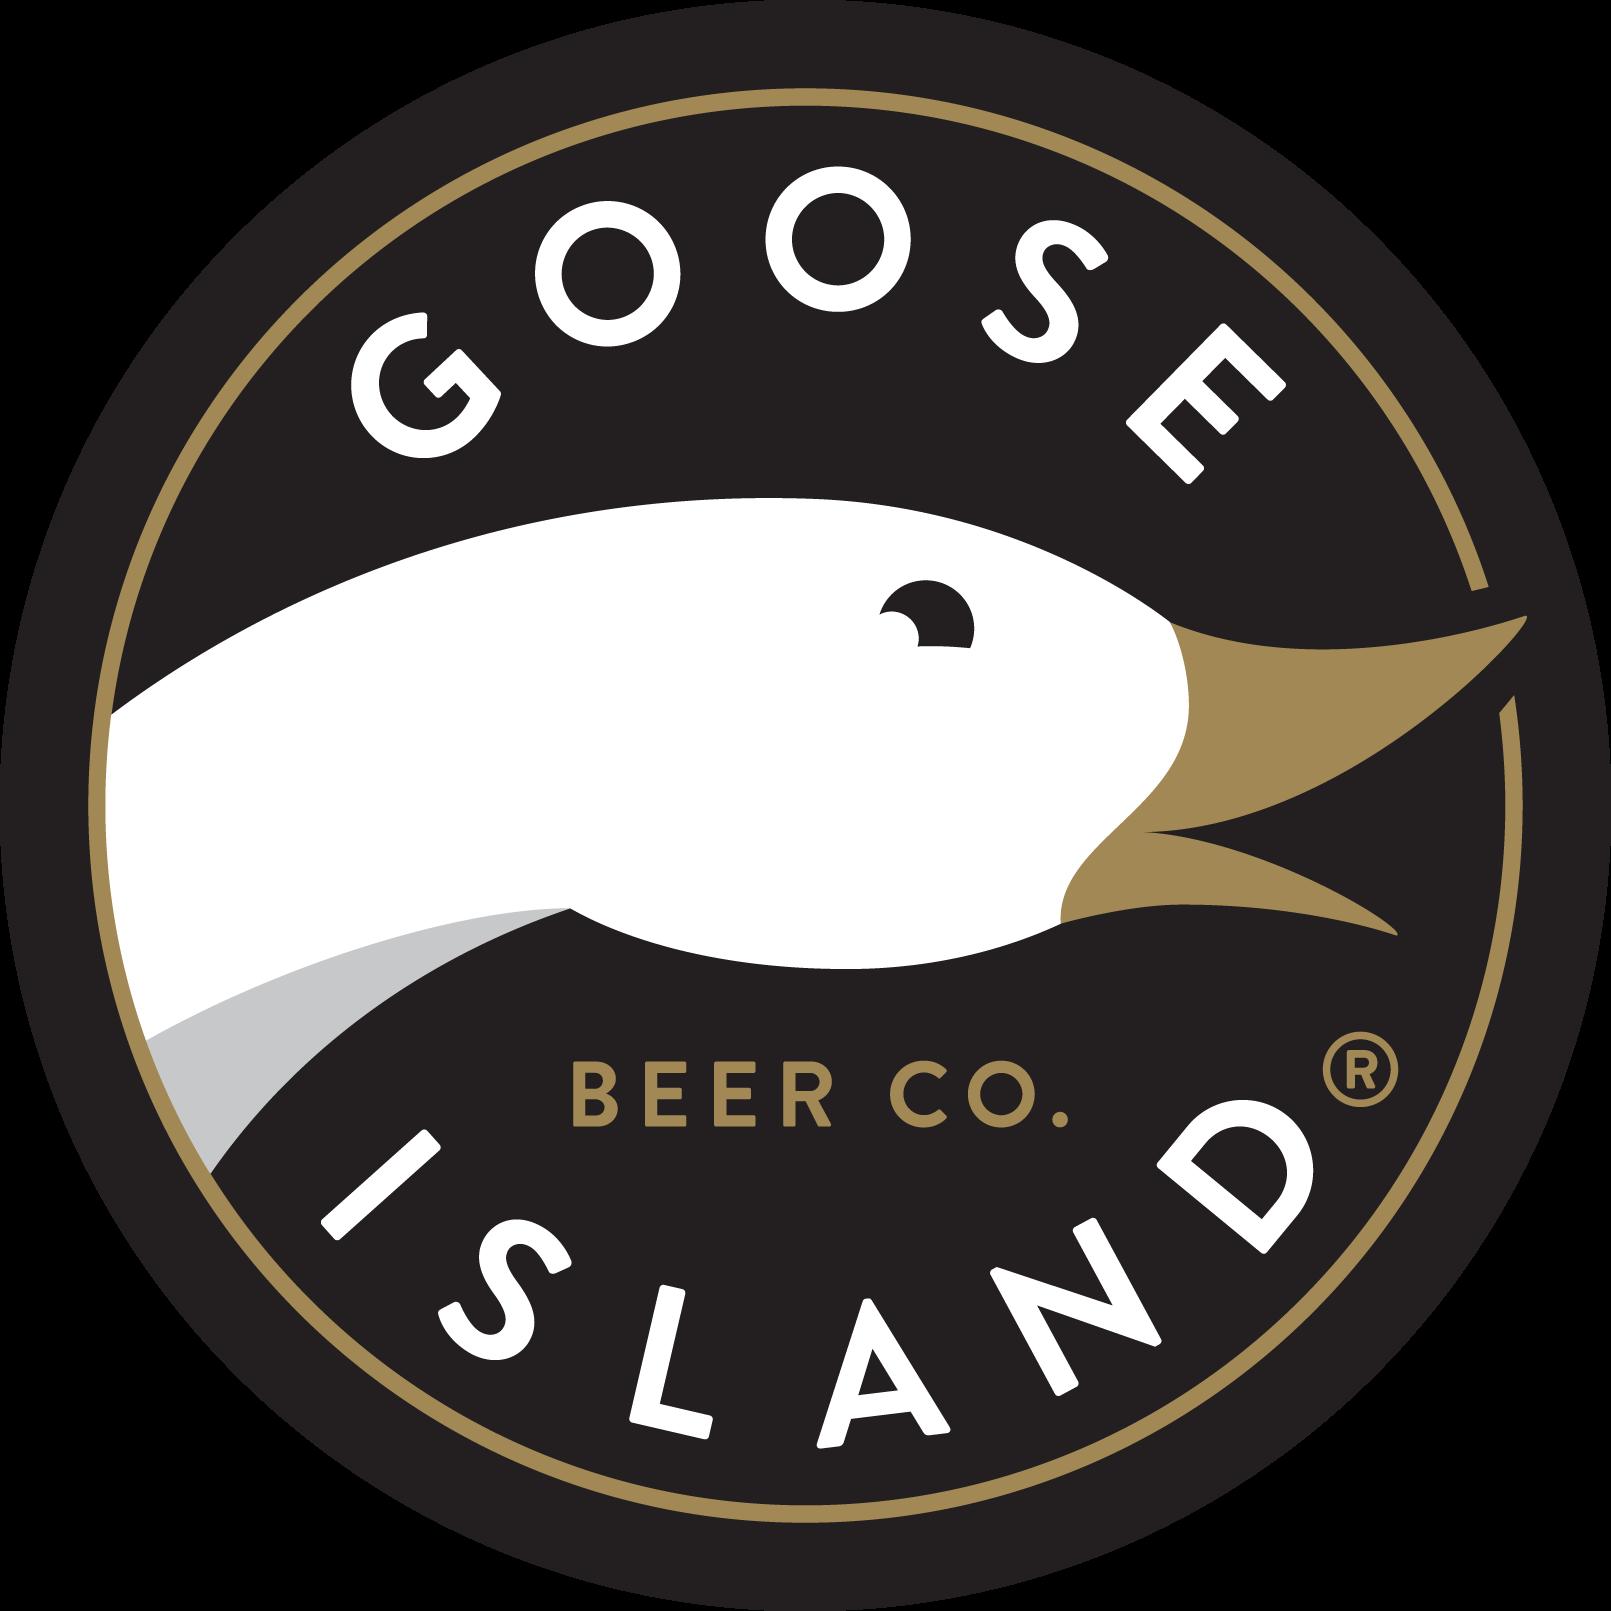 Goose Island Beer Co.